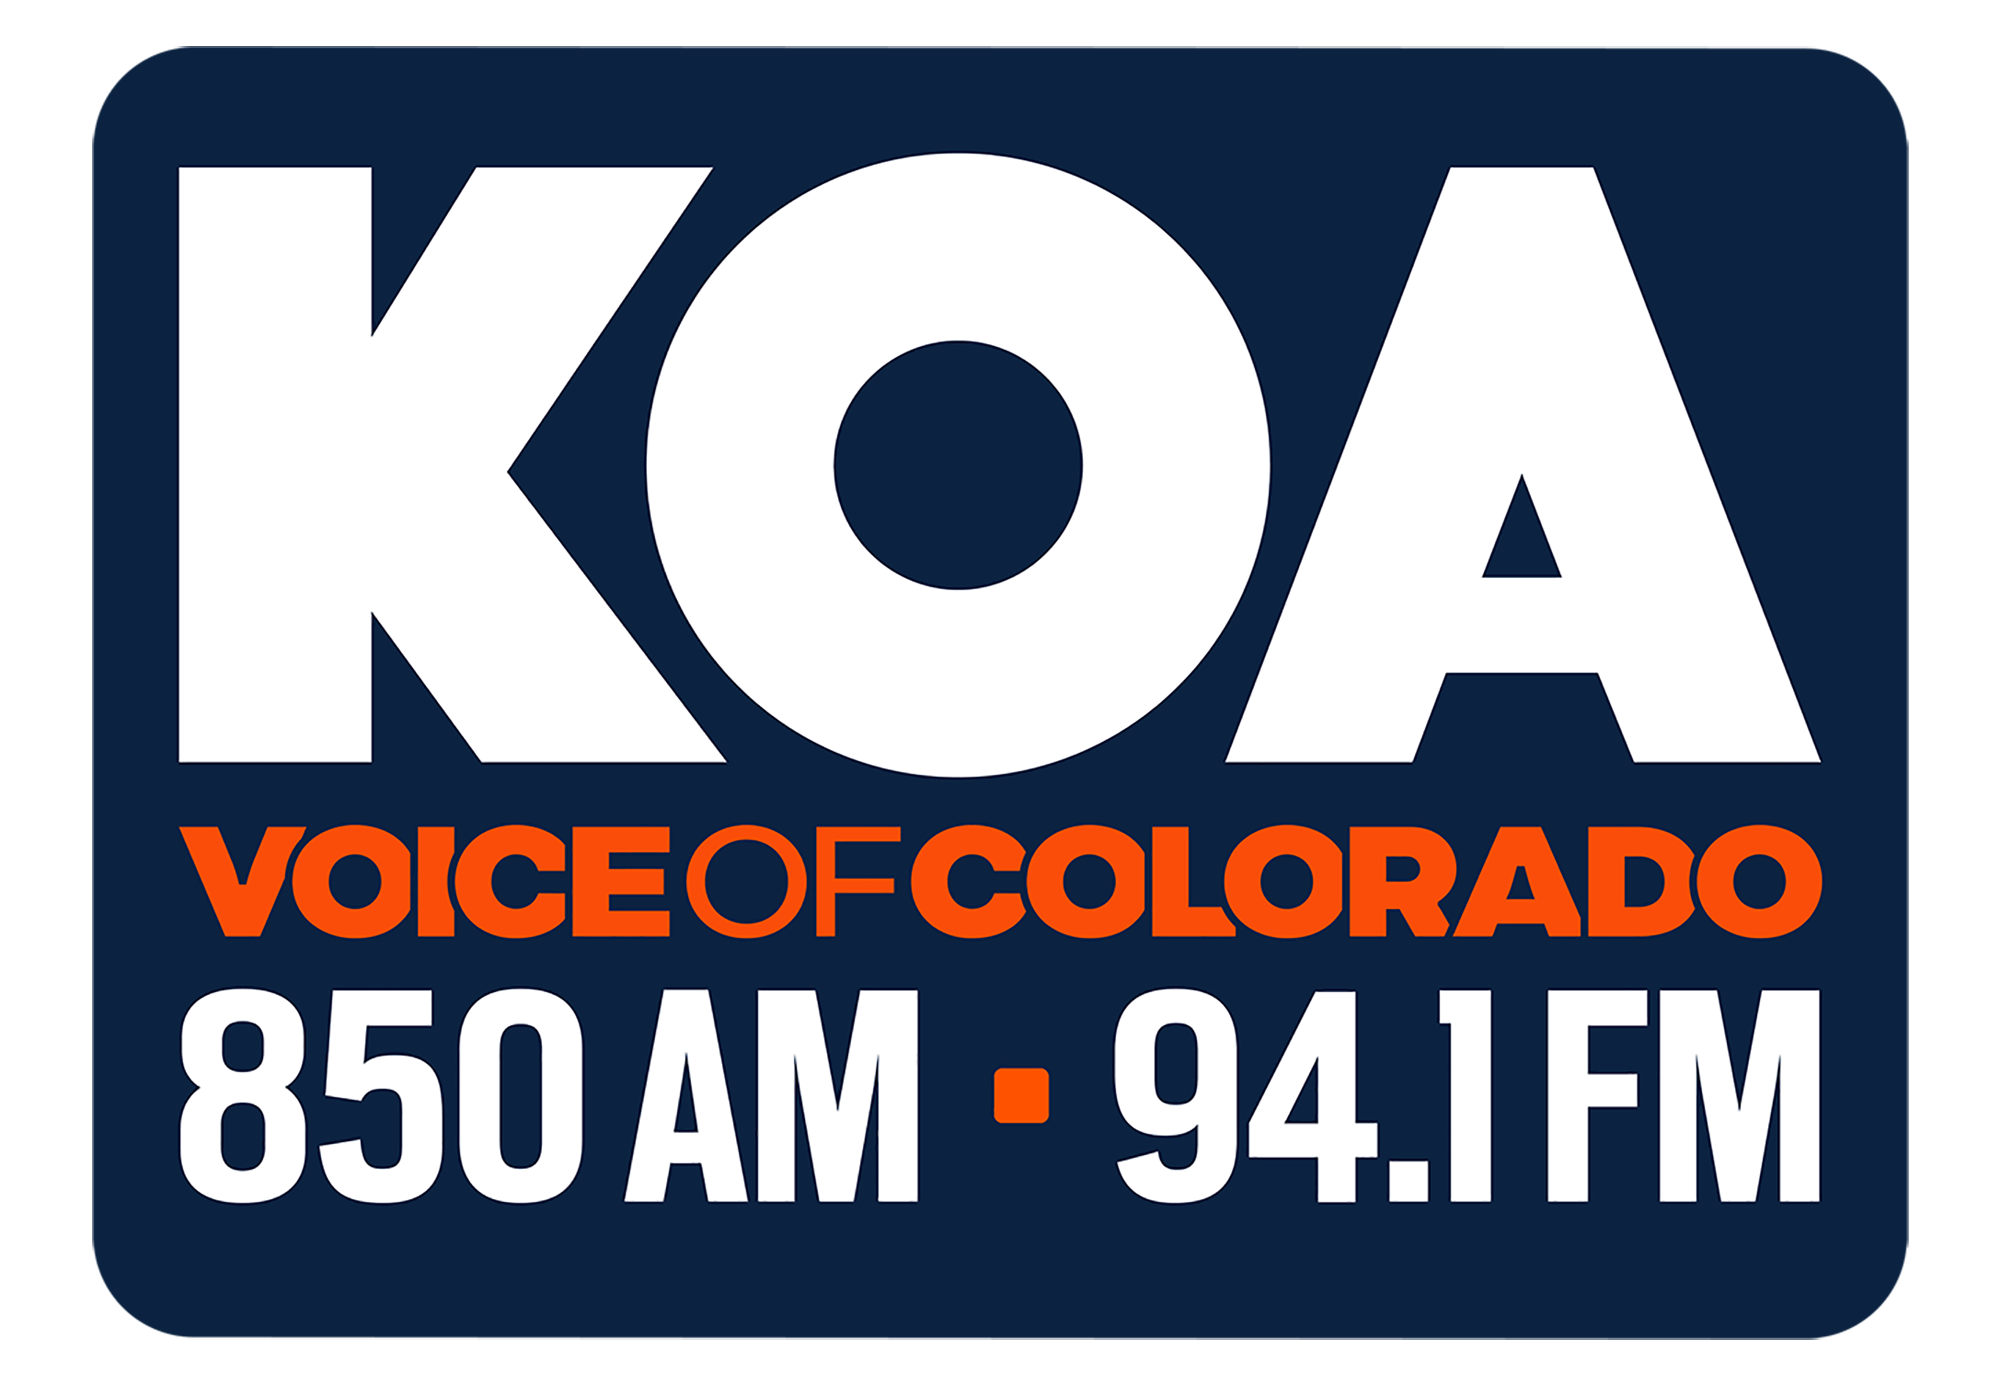 KOA 850 AM & 94 1 FM - The Voice of Colorado